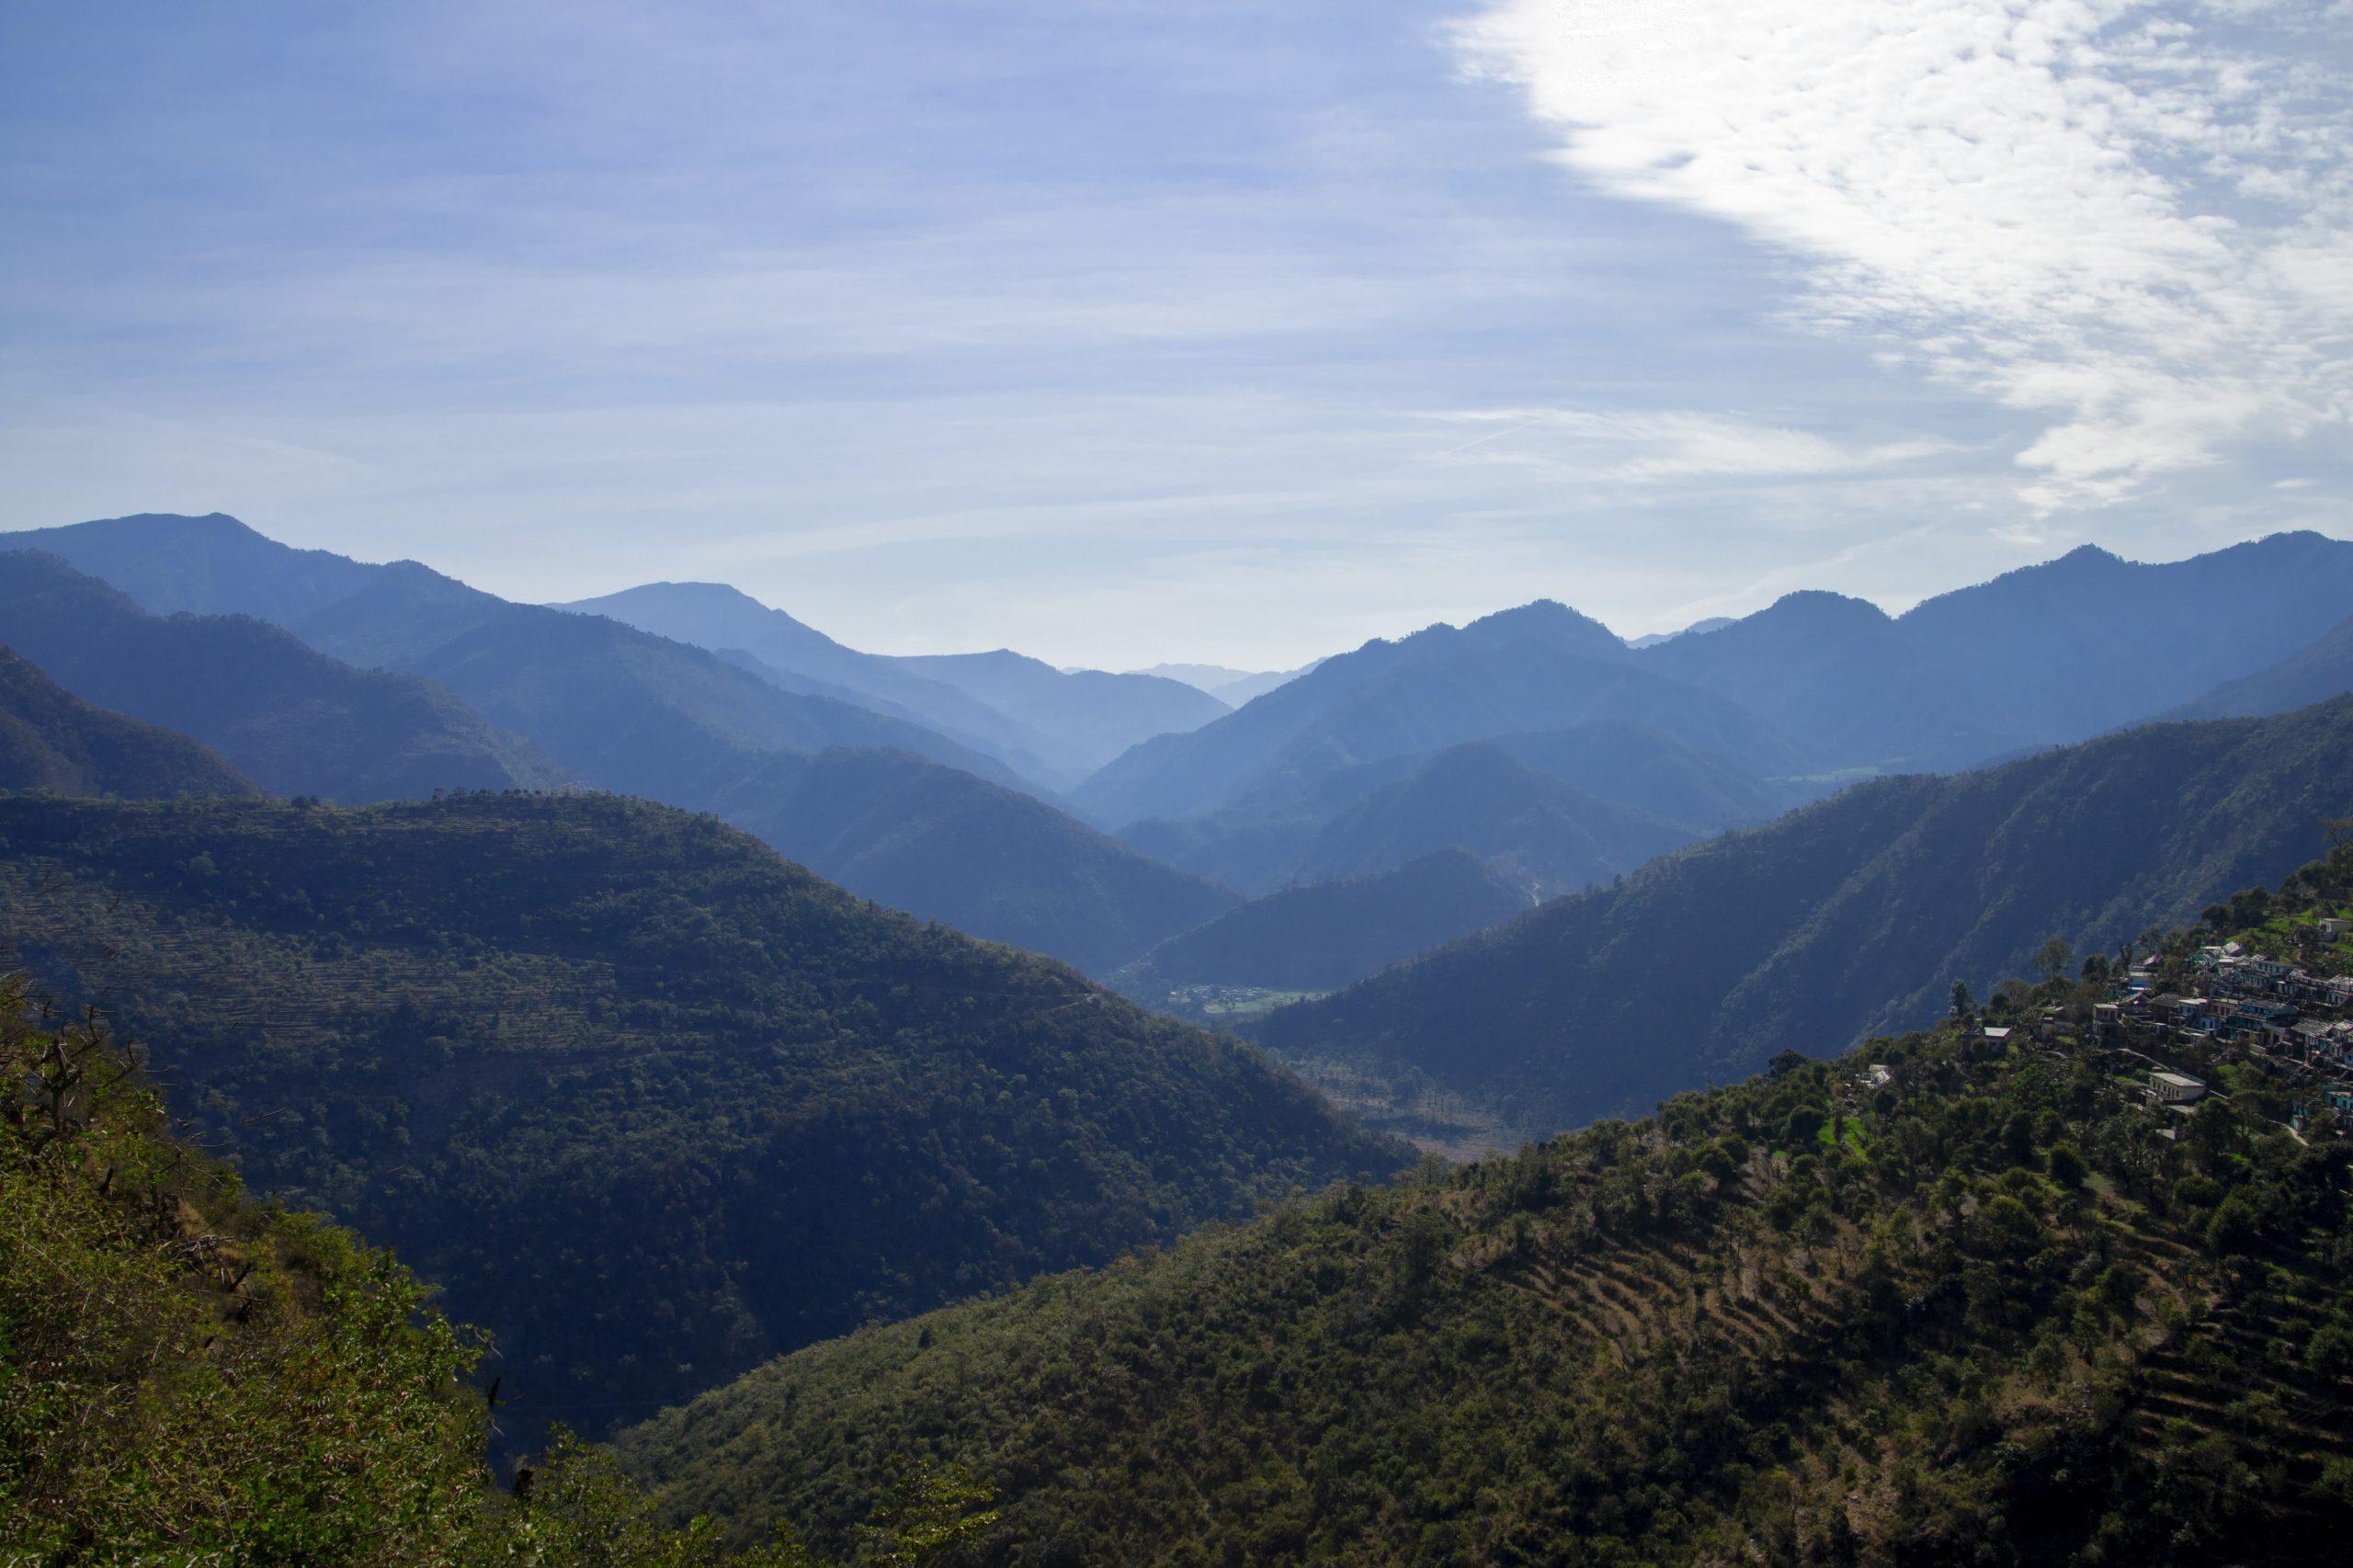 Scenery of mountains of Uttarakhand.